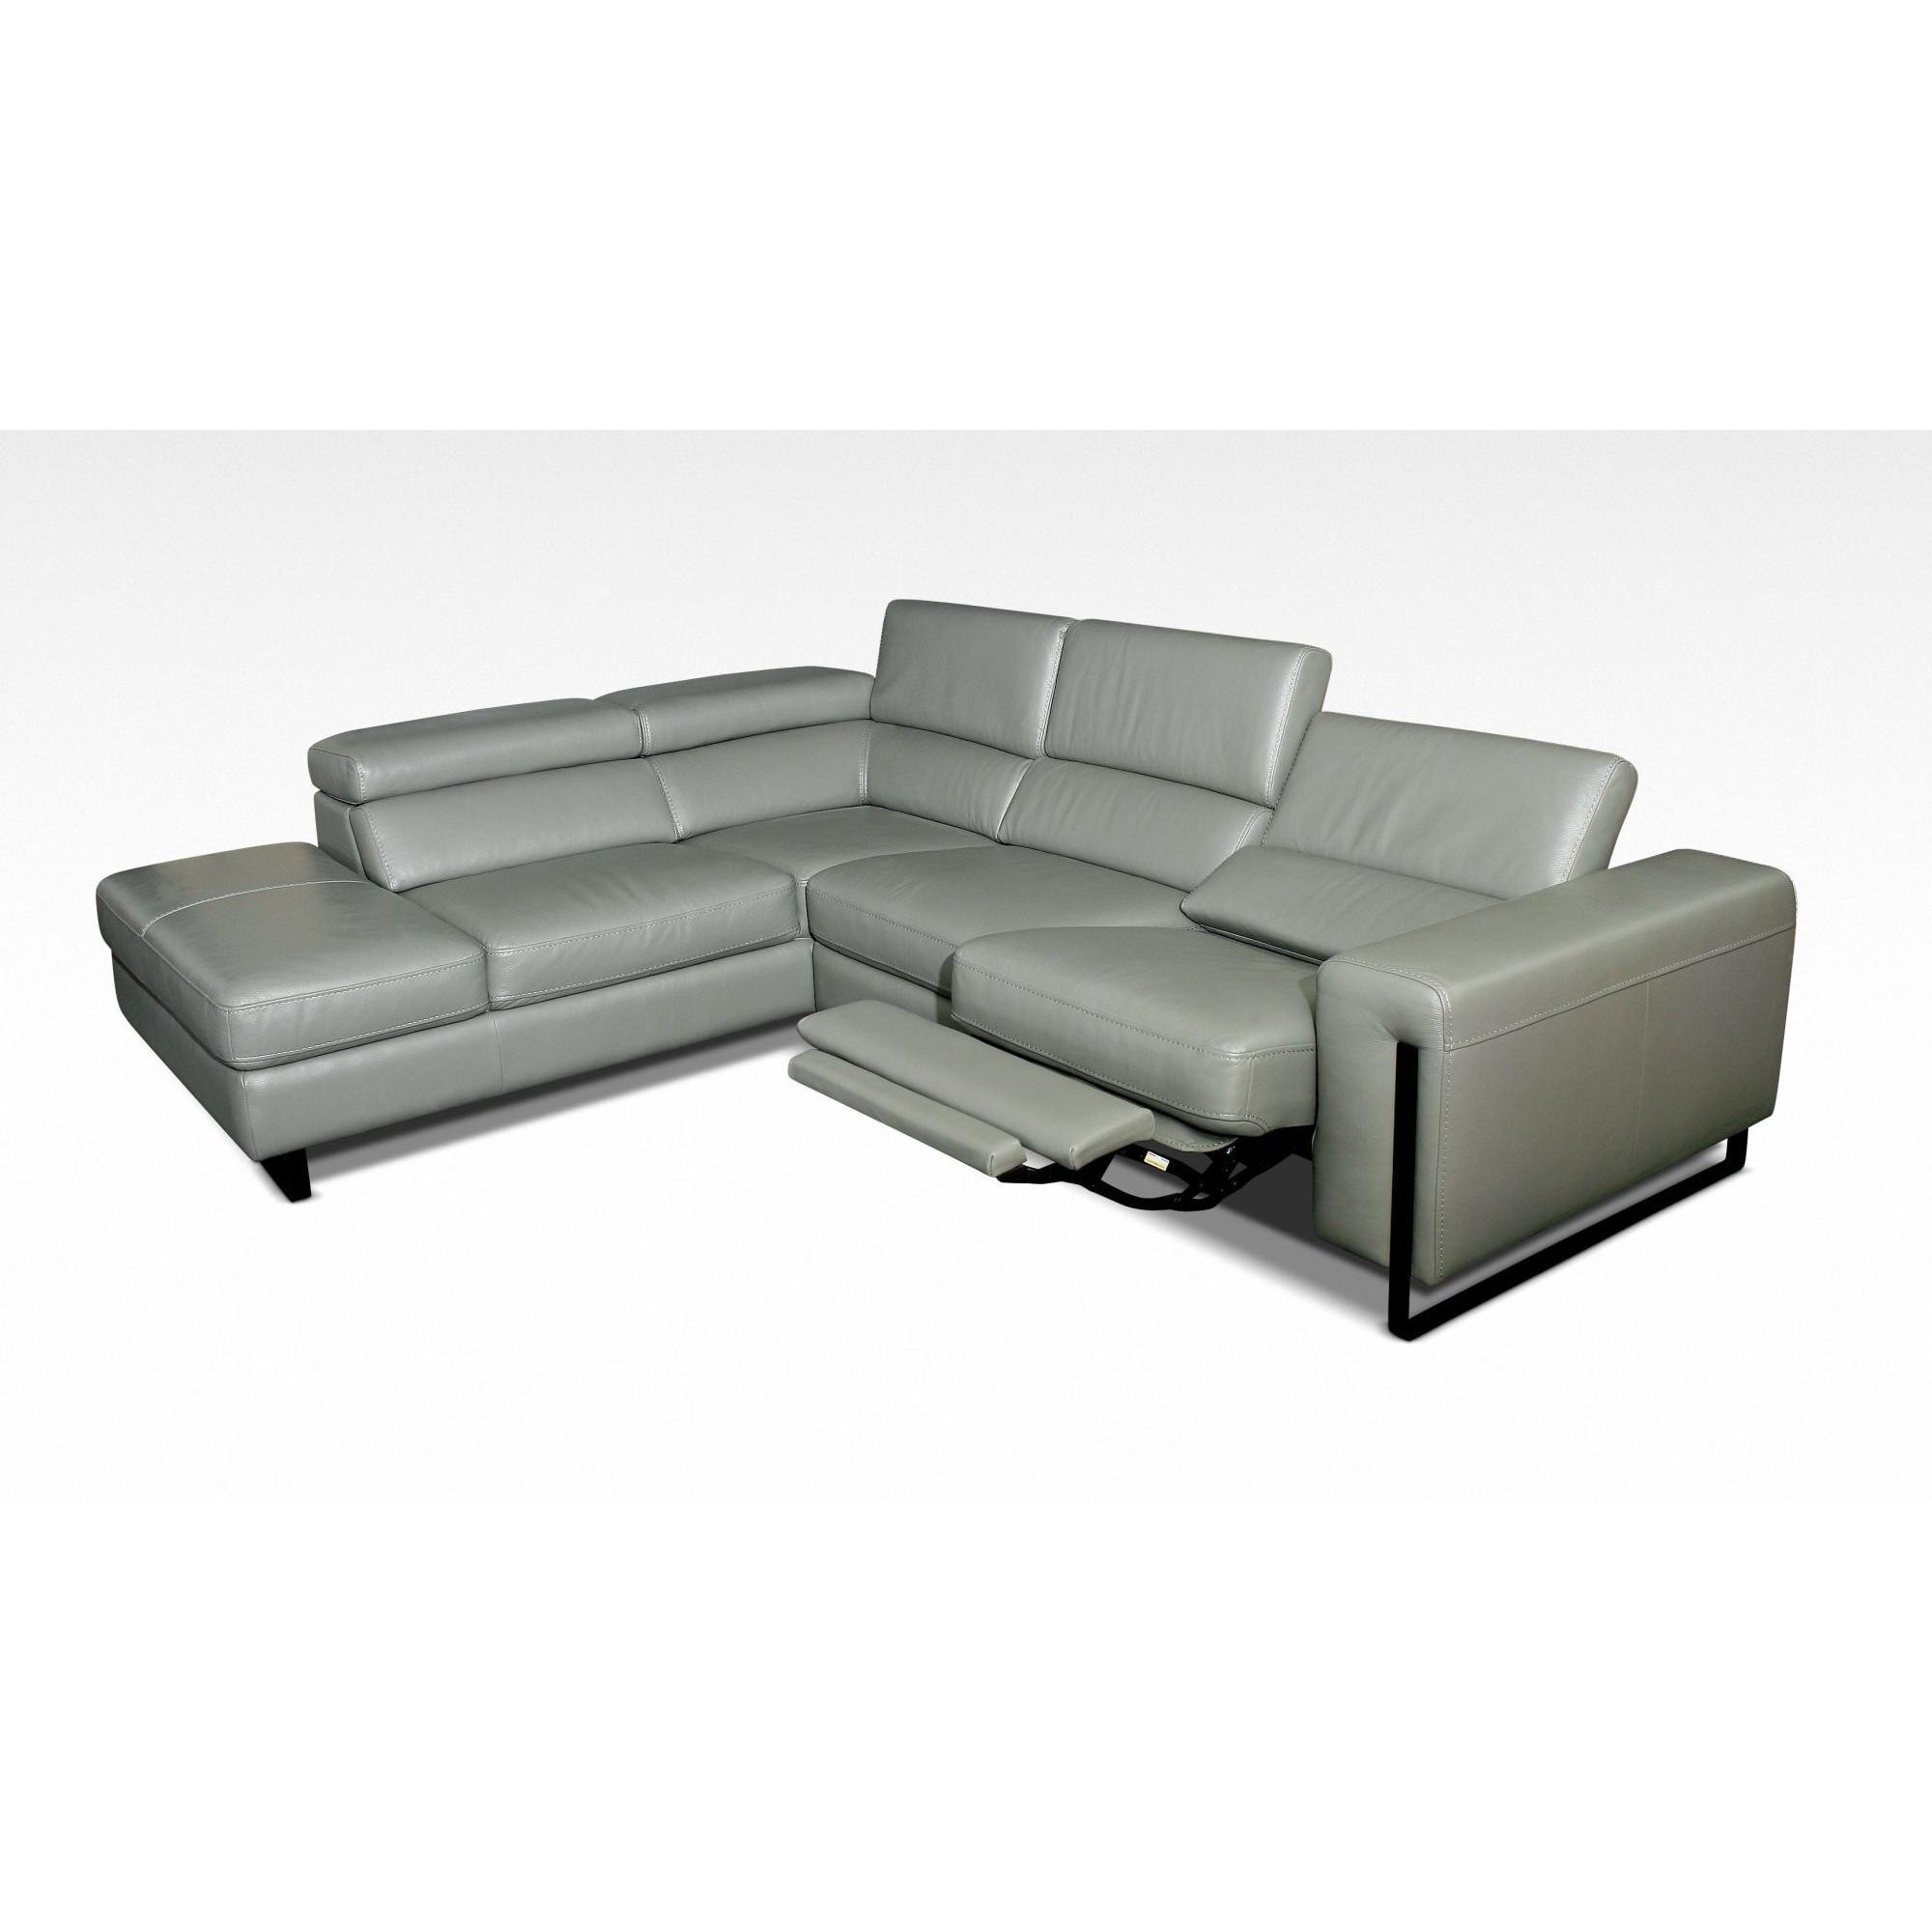 Canapé d angle relax design avec méri nne gauche en cuir